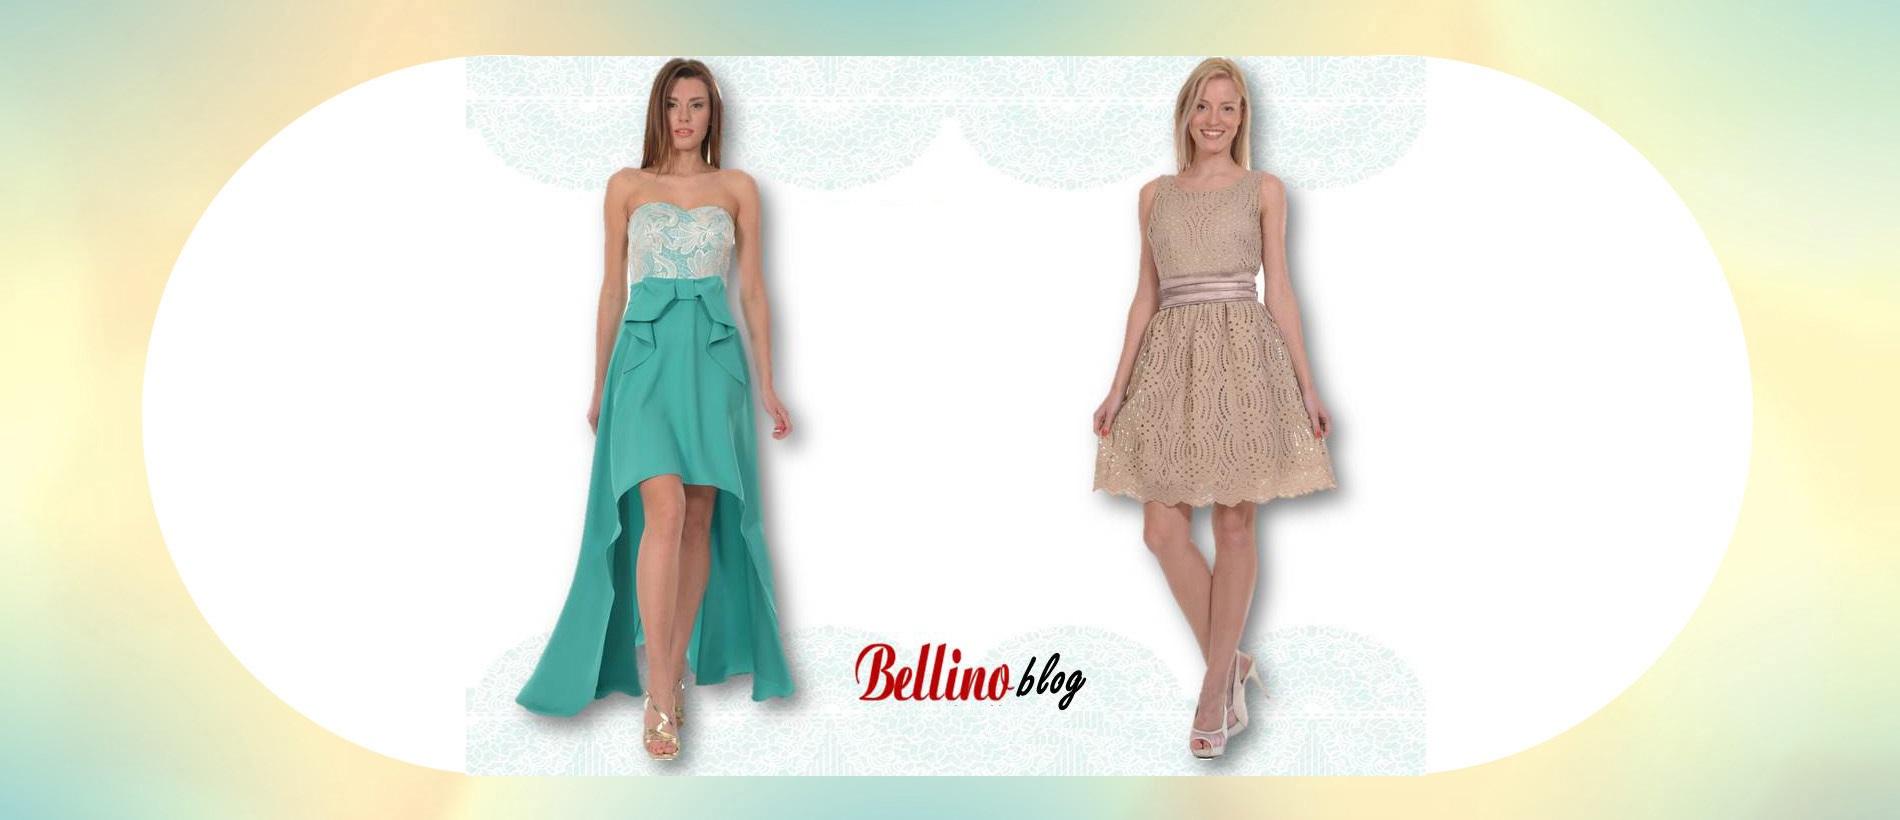 Bellino-SS-2016-Slider-Image-Blog